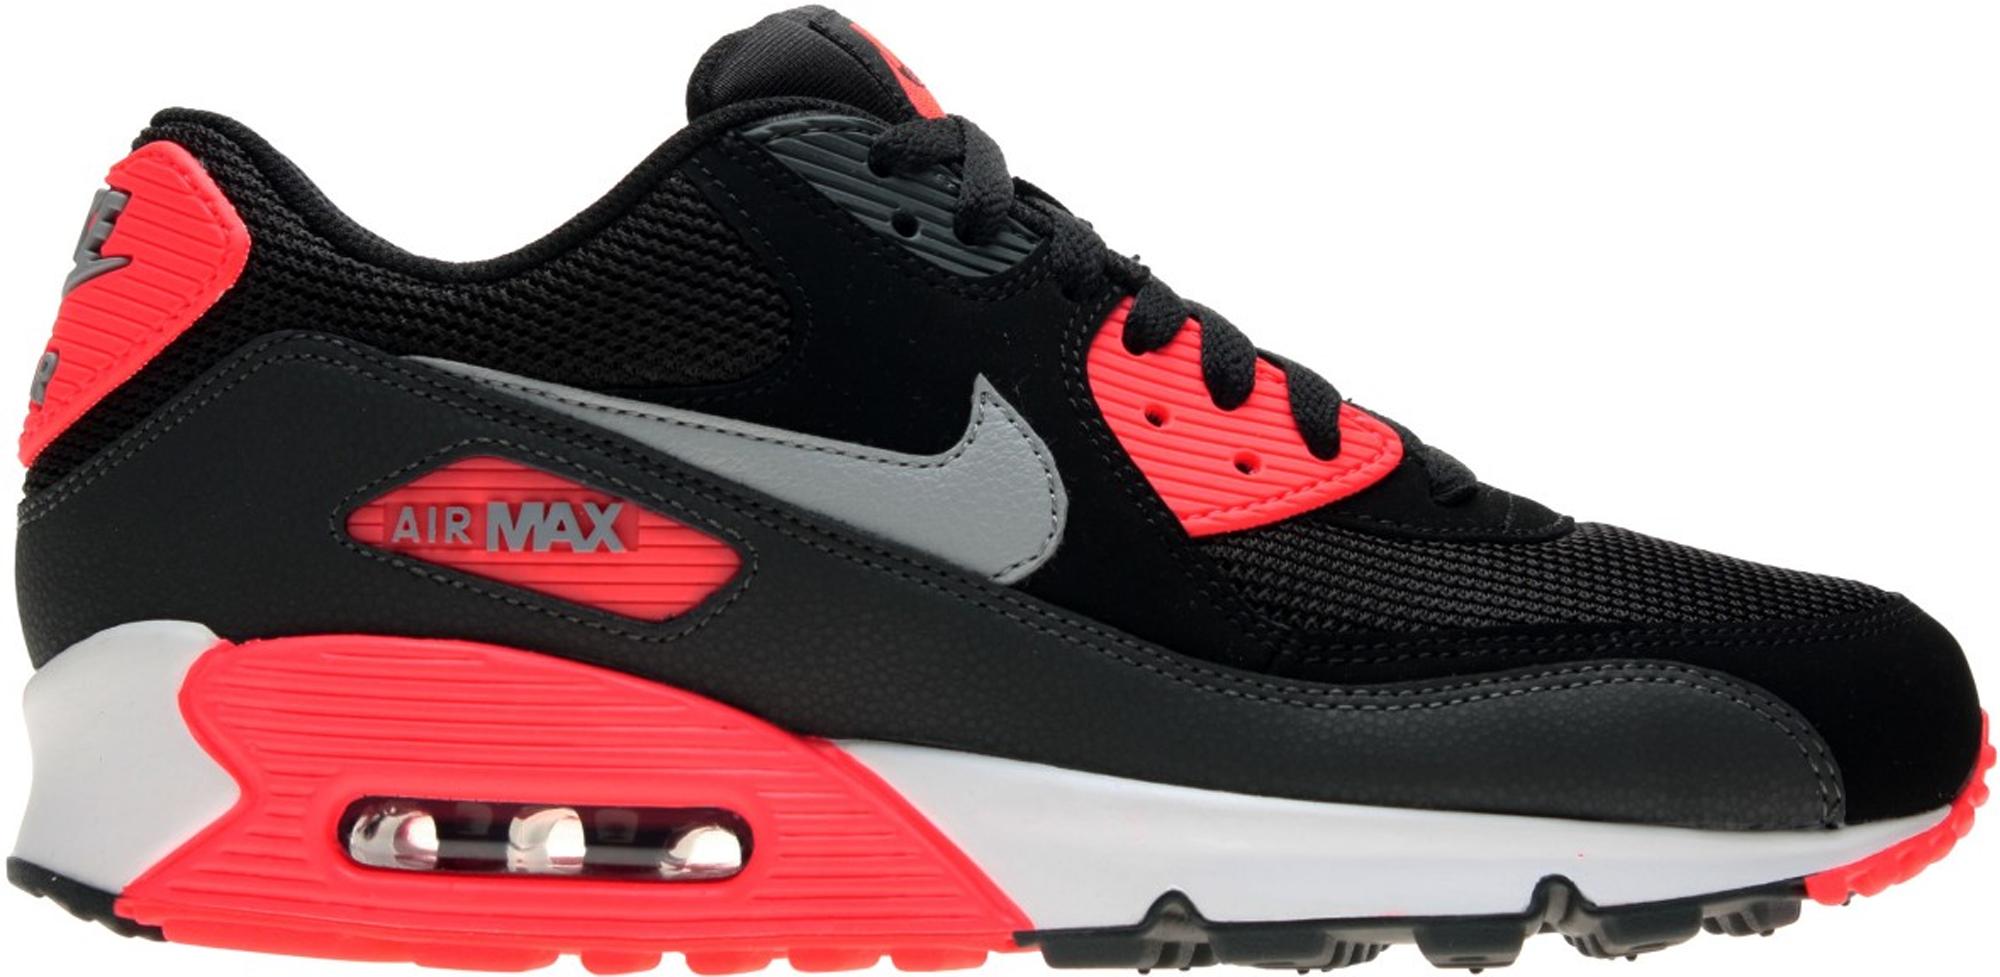 Nike Air Max 90 Black Infrared (2013